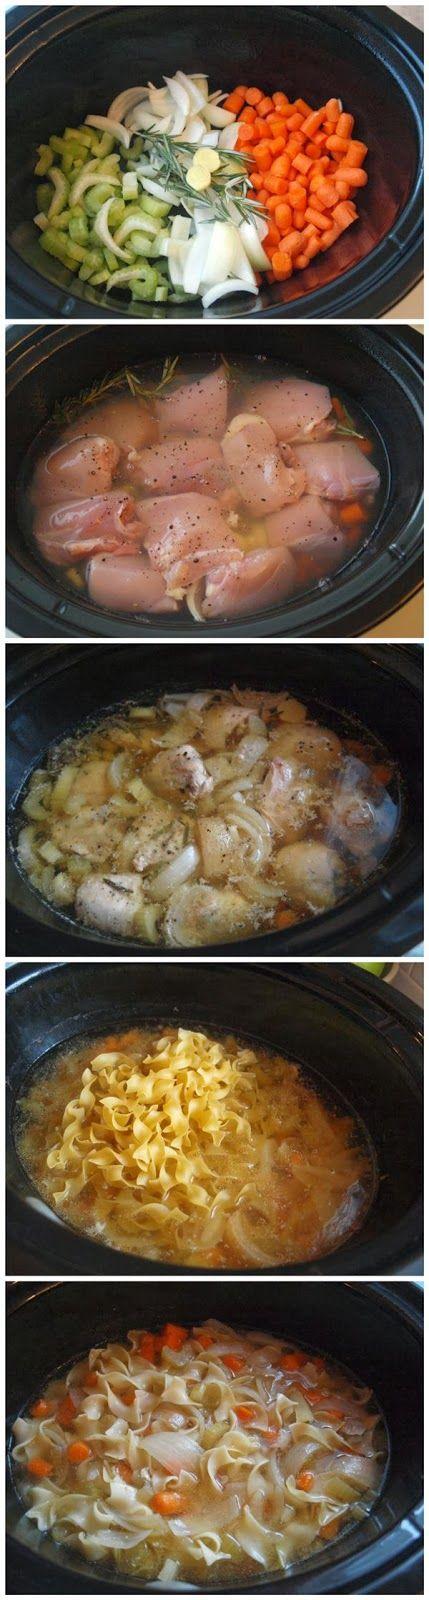 Crockpot Chicken Noodle Soup - Recipe Favorite